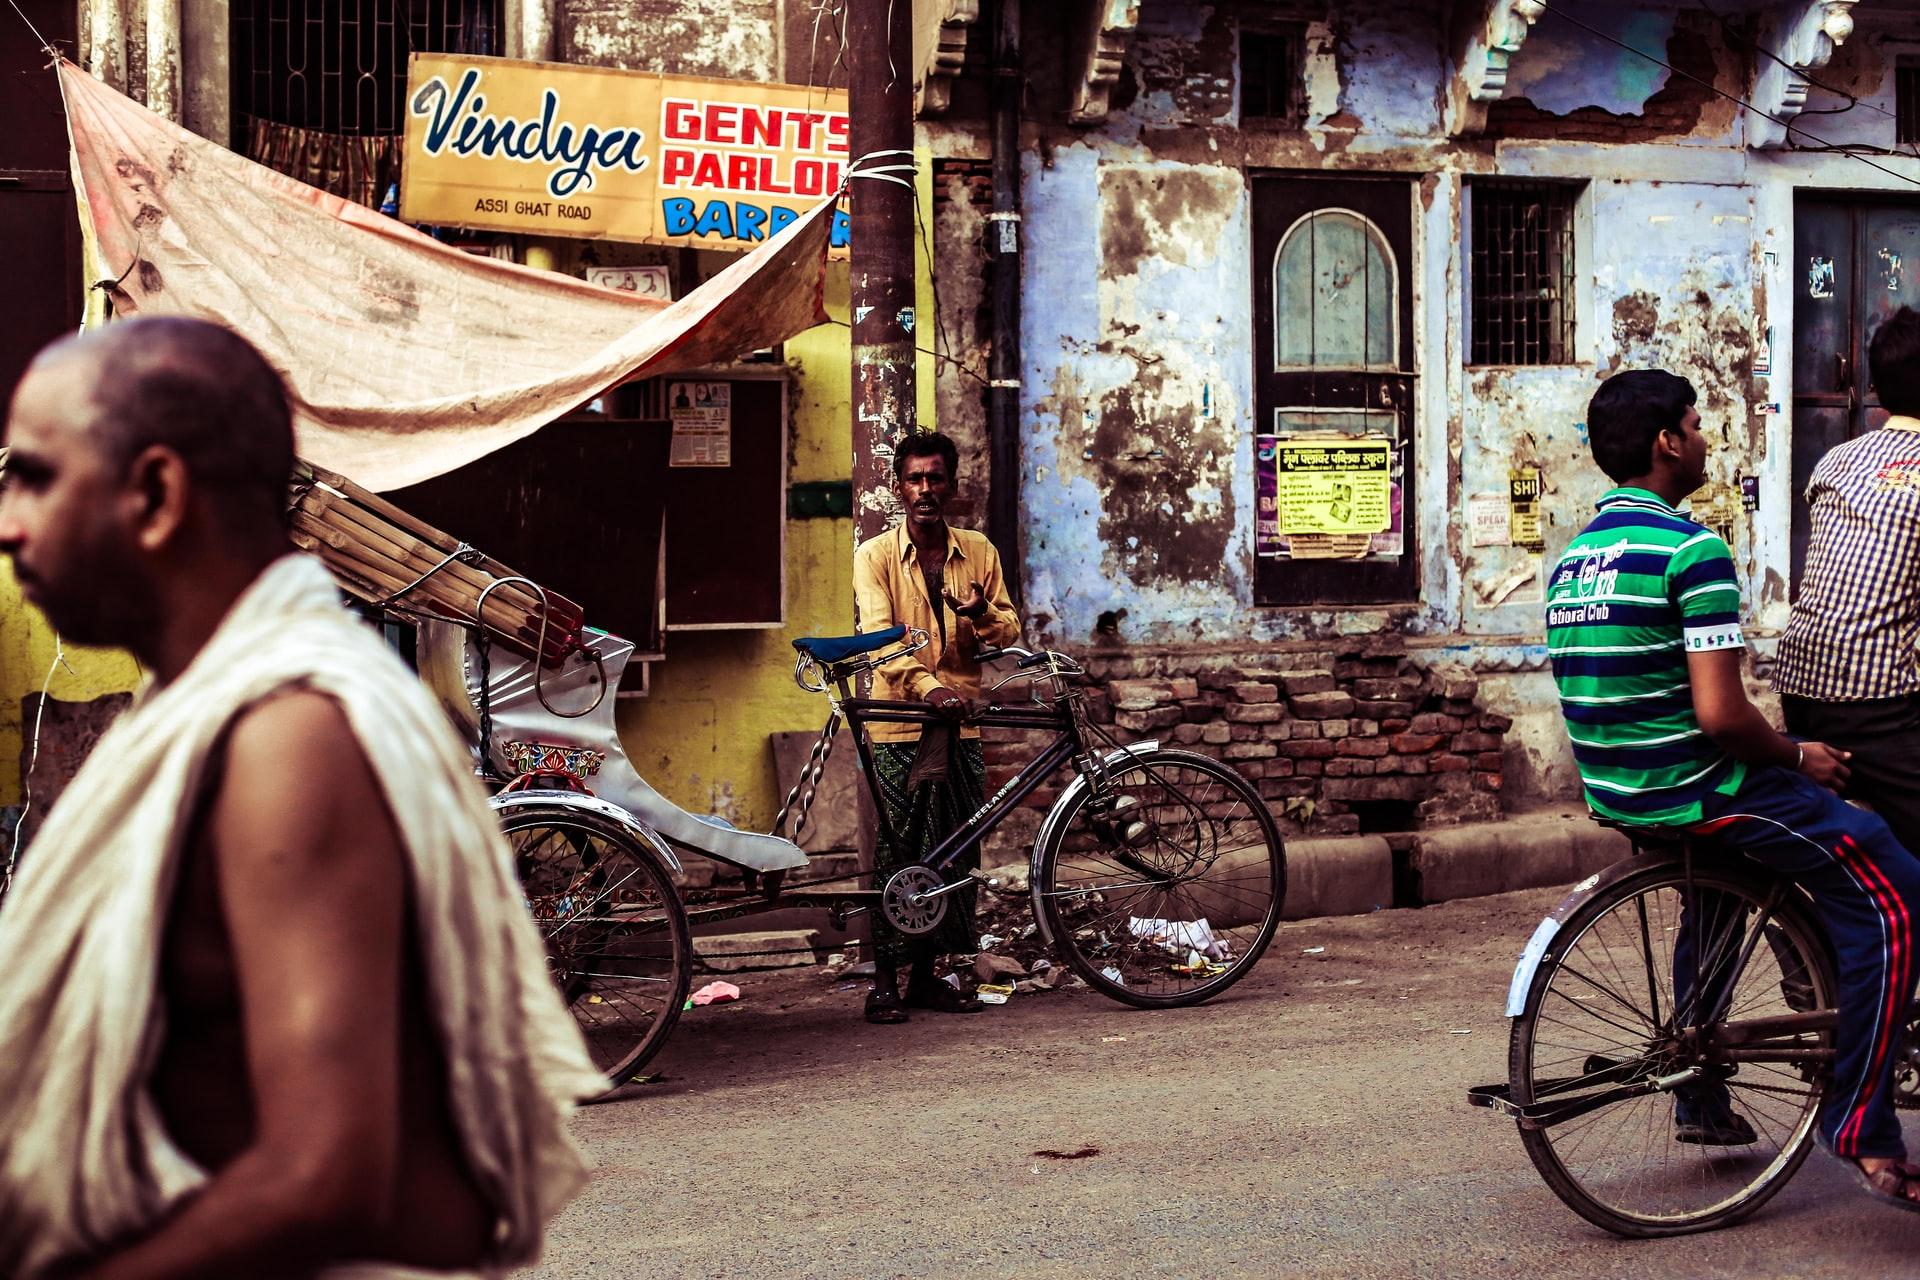 Streets of Varanasi, India - Charl Folscher / Unsplash